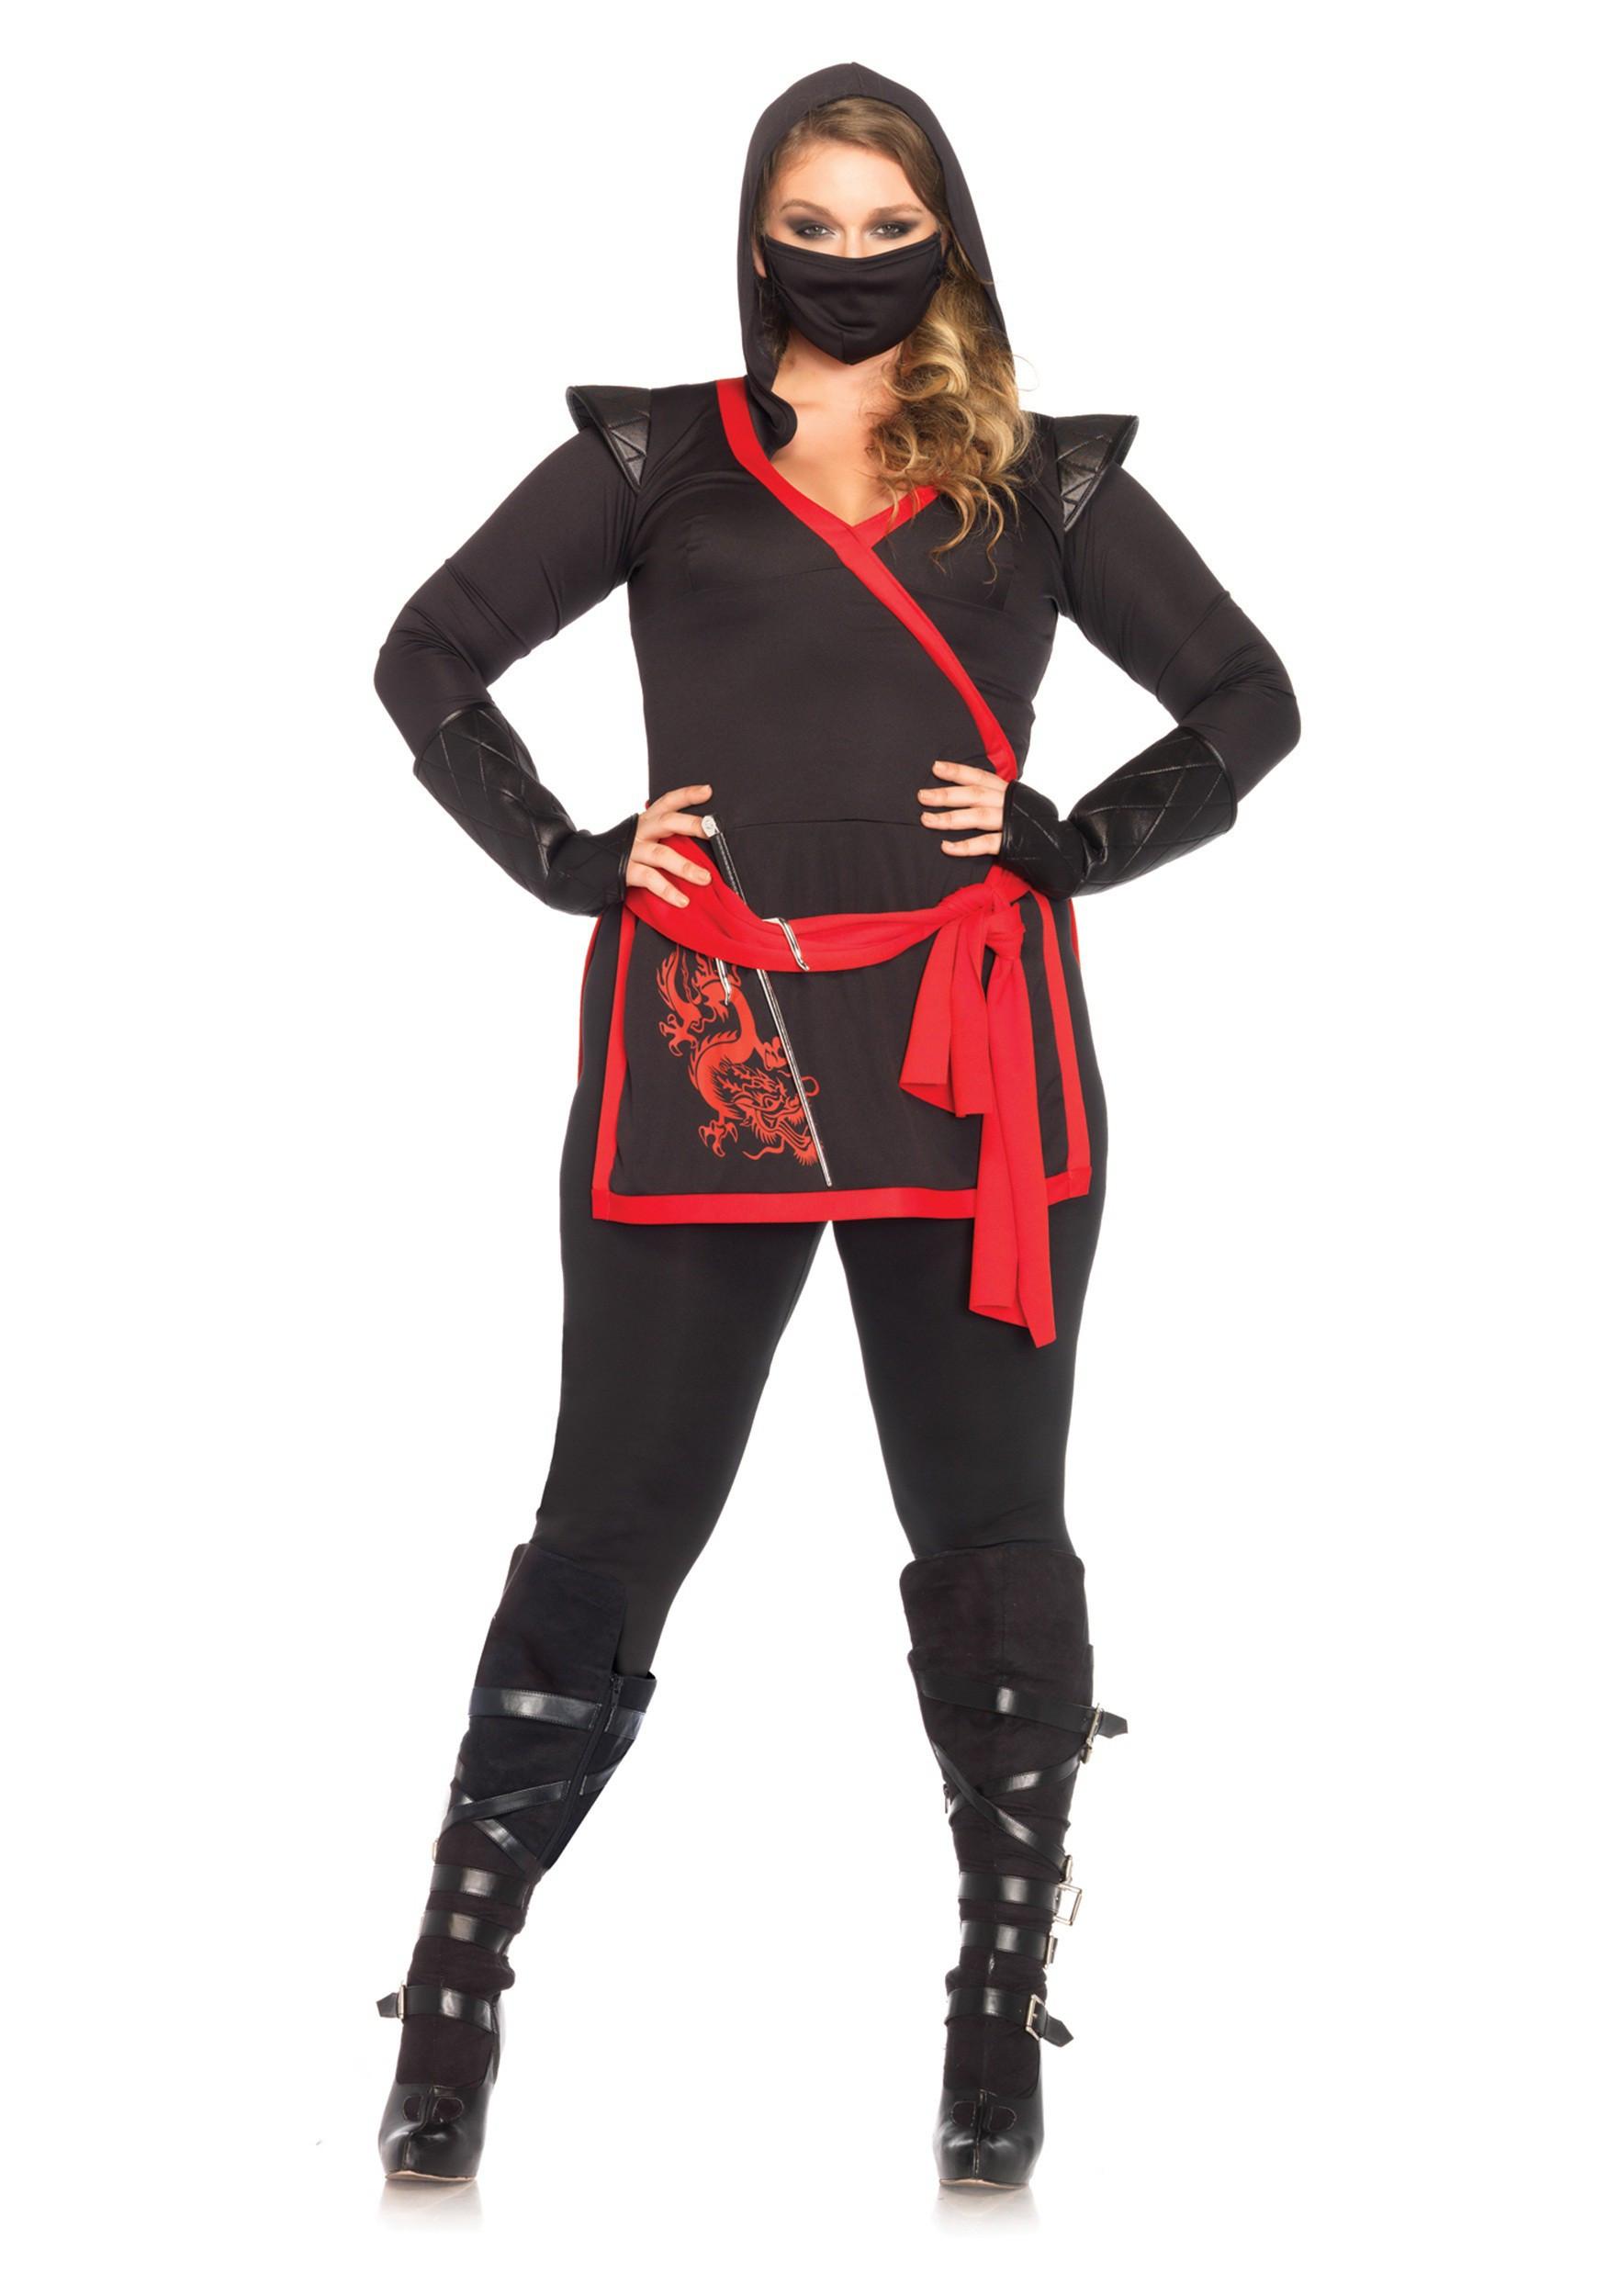 Female Ninja Costume DIY  Plus Size Ninja Assassin Costume 1X 2X 3X 4X